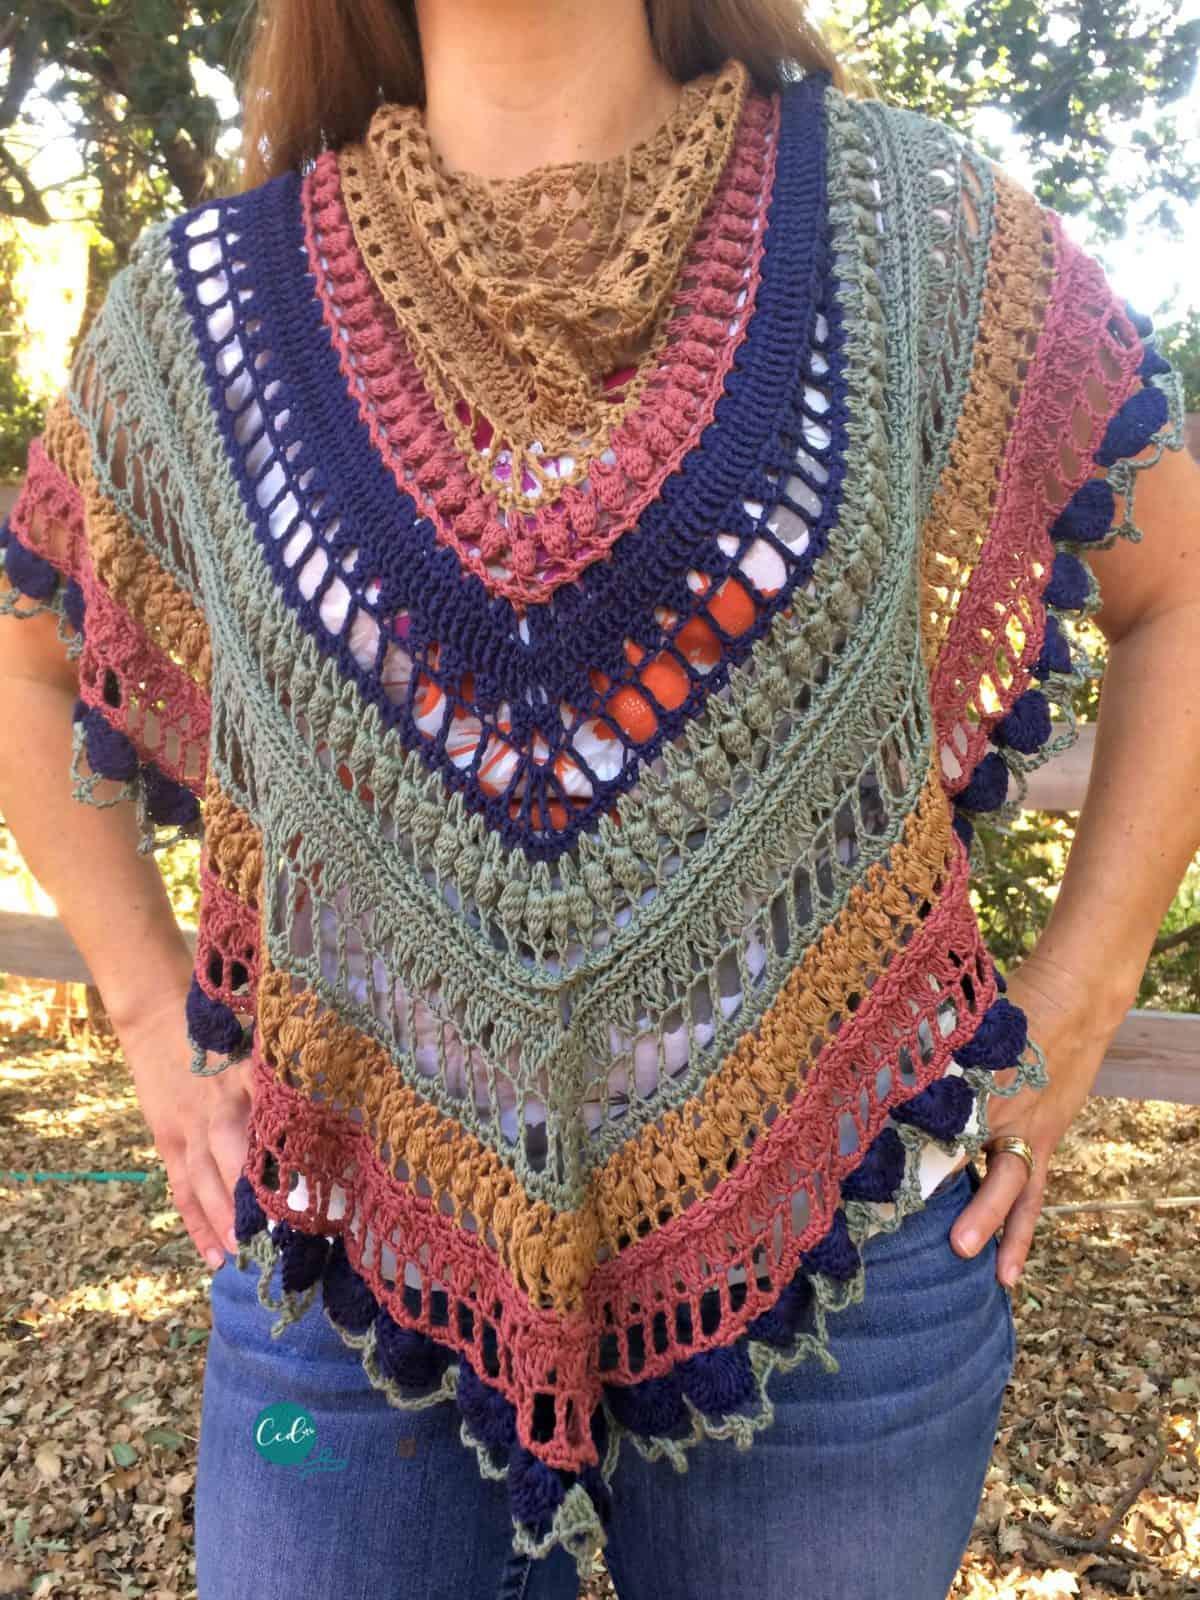 Woman in multicolored, lacy shawlette.